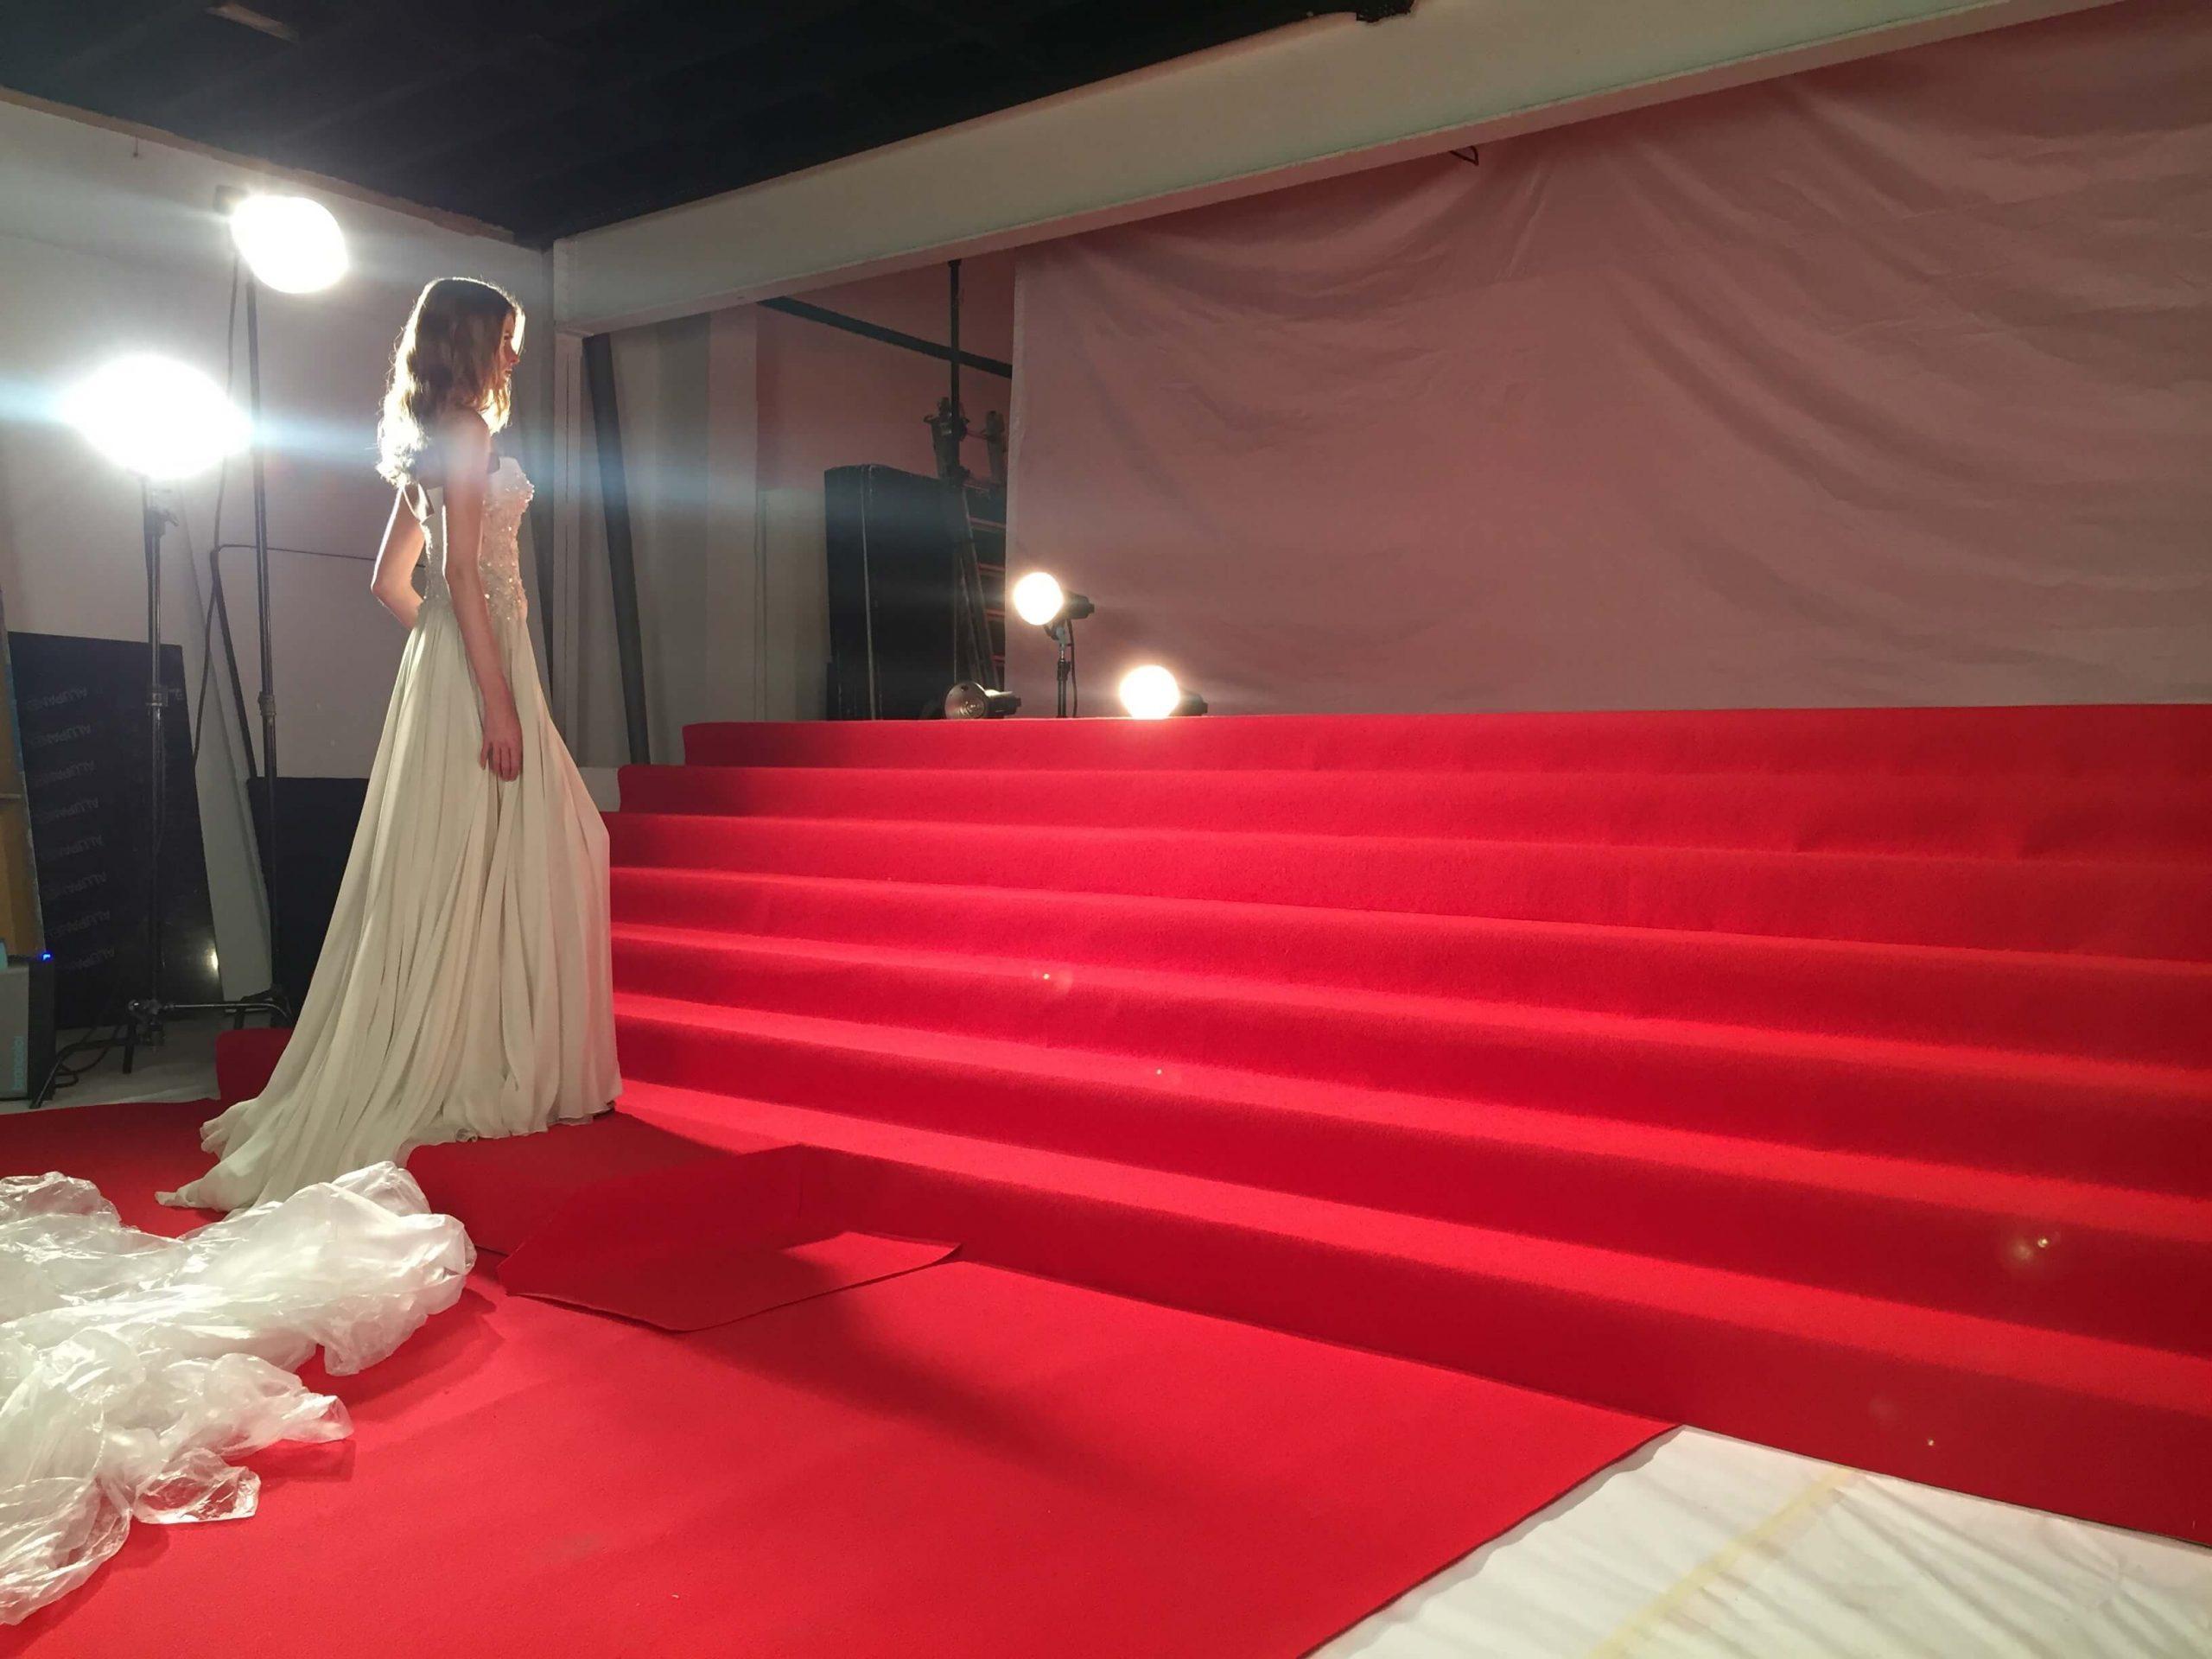 eliesaab-parfum-luxe-redcarpet-resortcollection-videoshoot-videoclip-setup-photoshoot-pub-okto-_01_PP